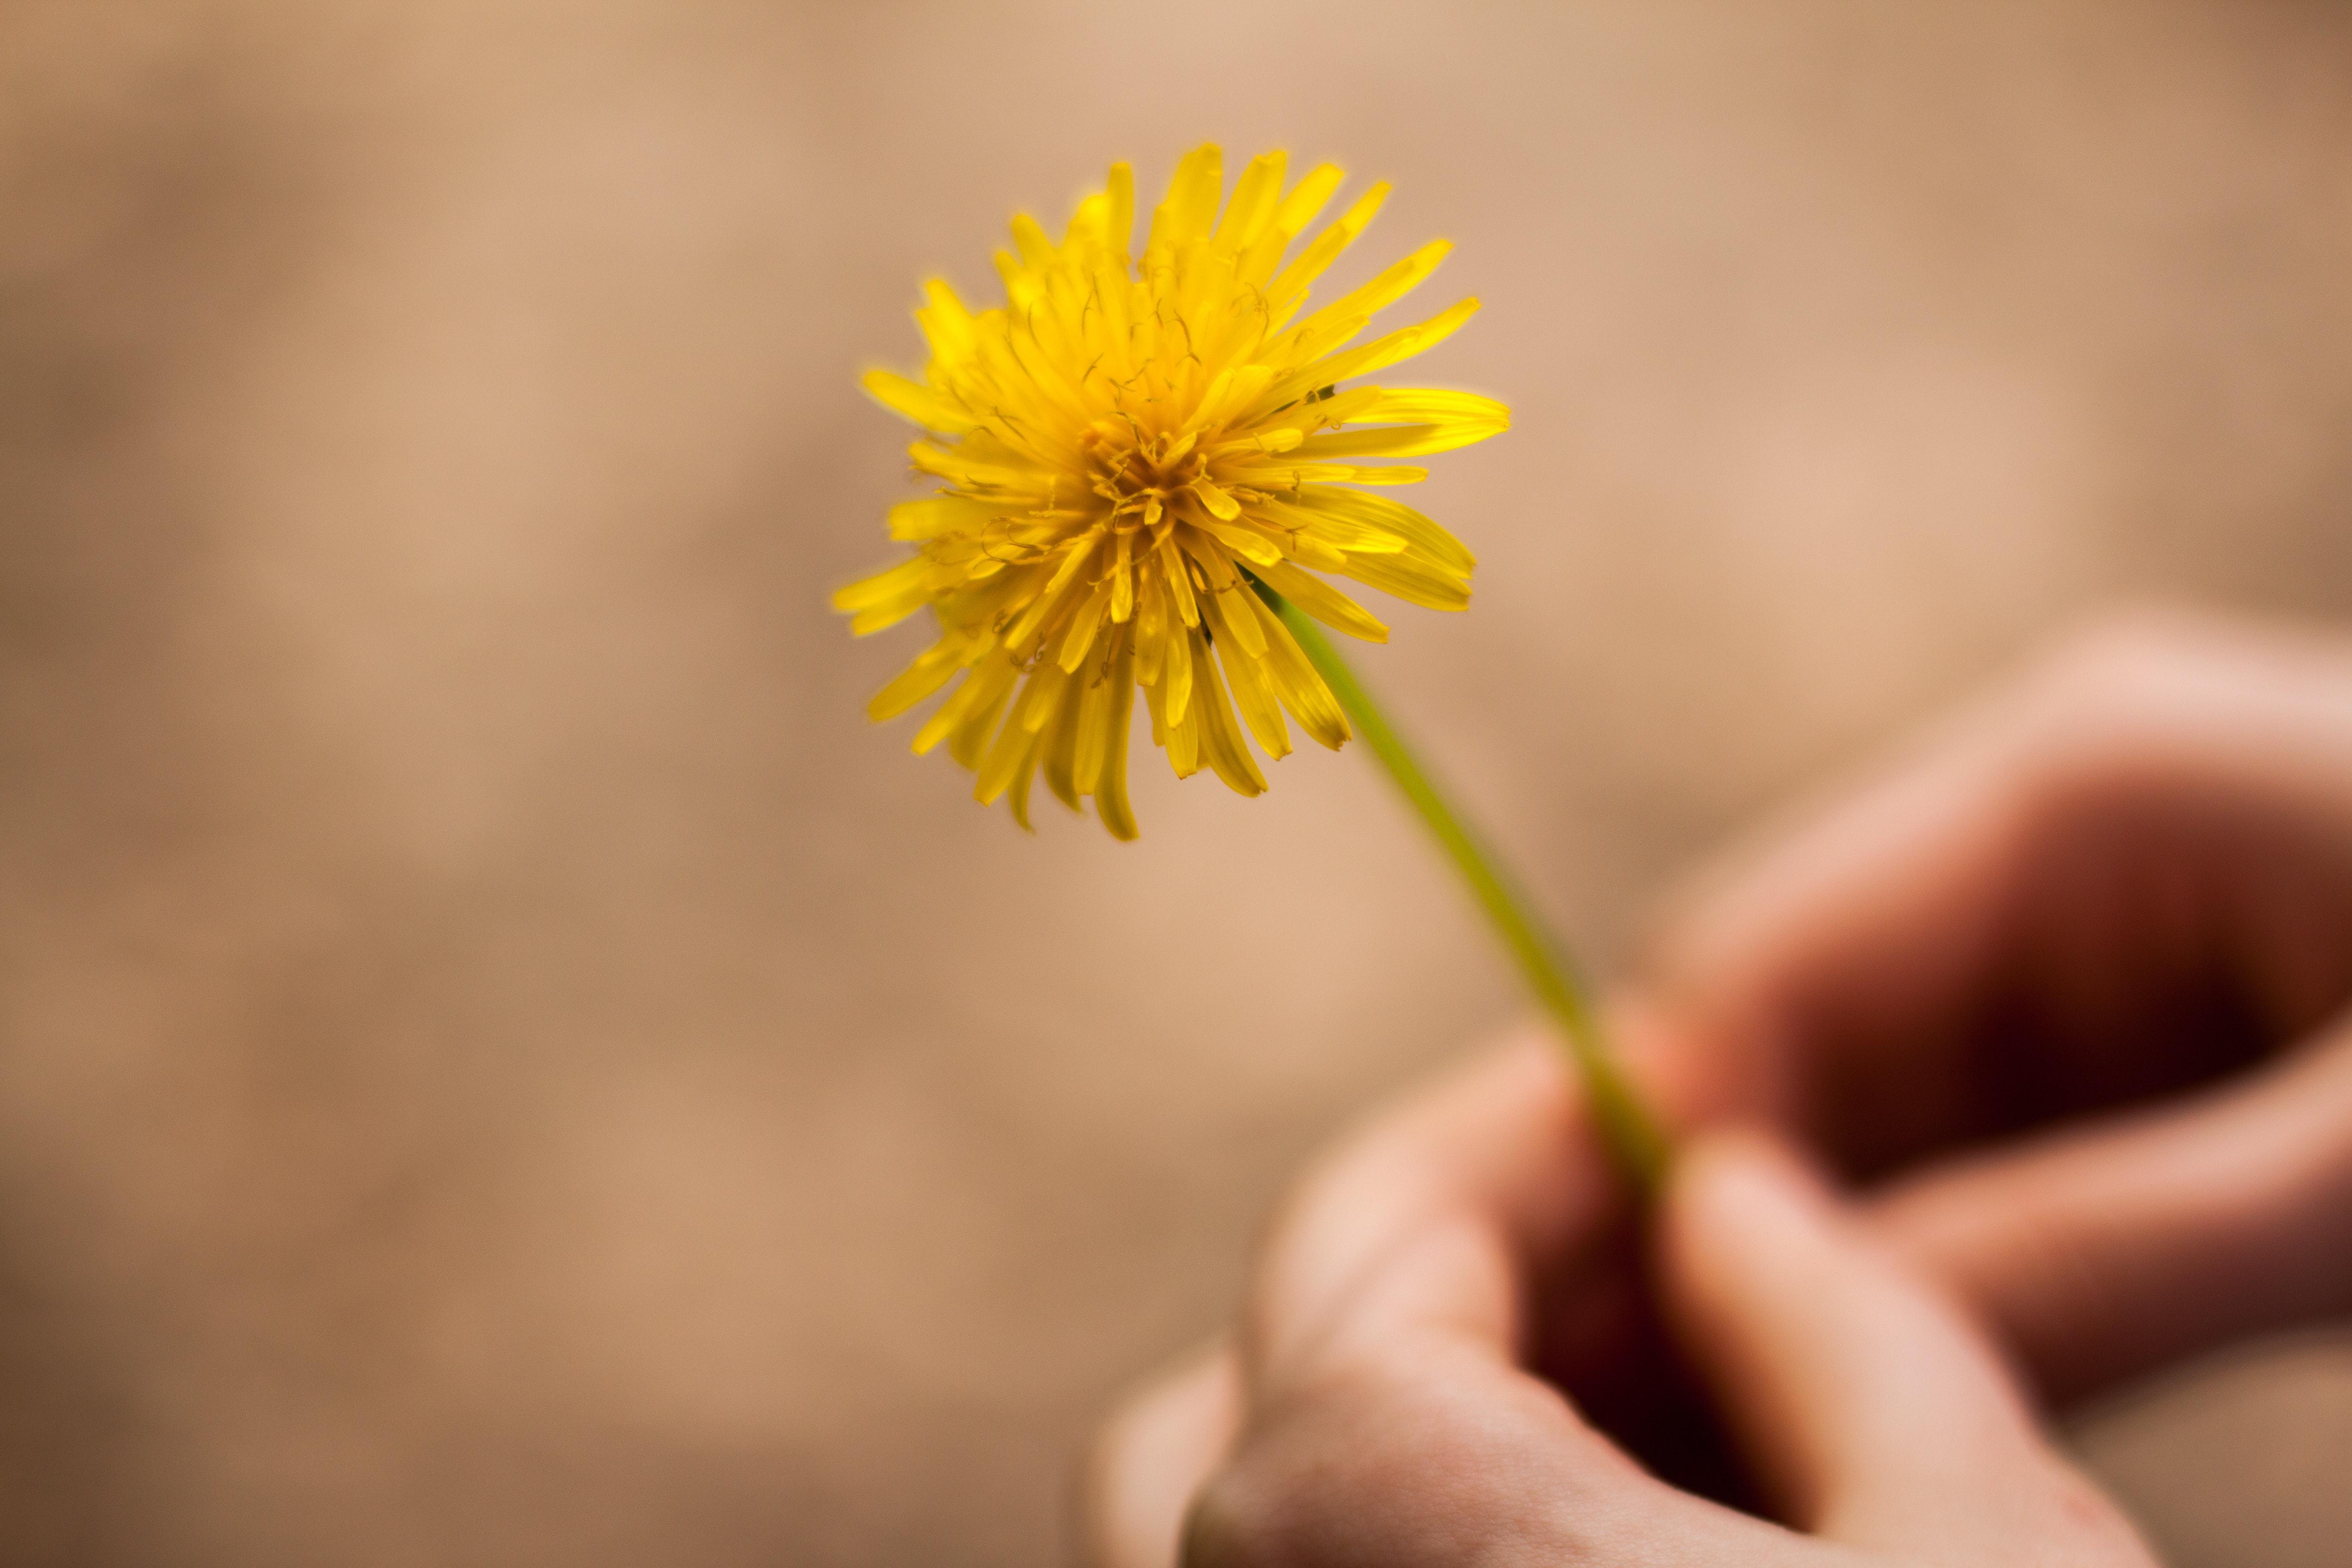 dandelion-for cure of coronavirus